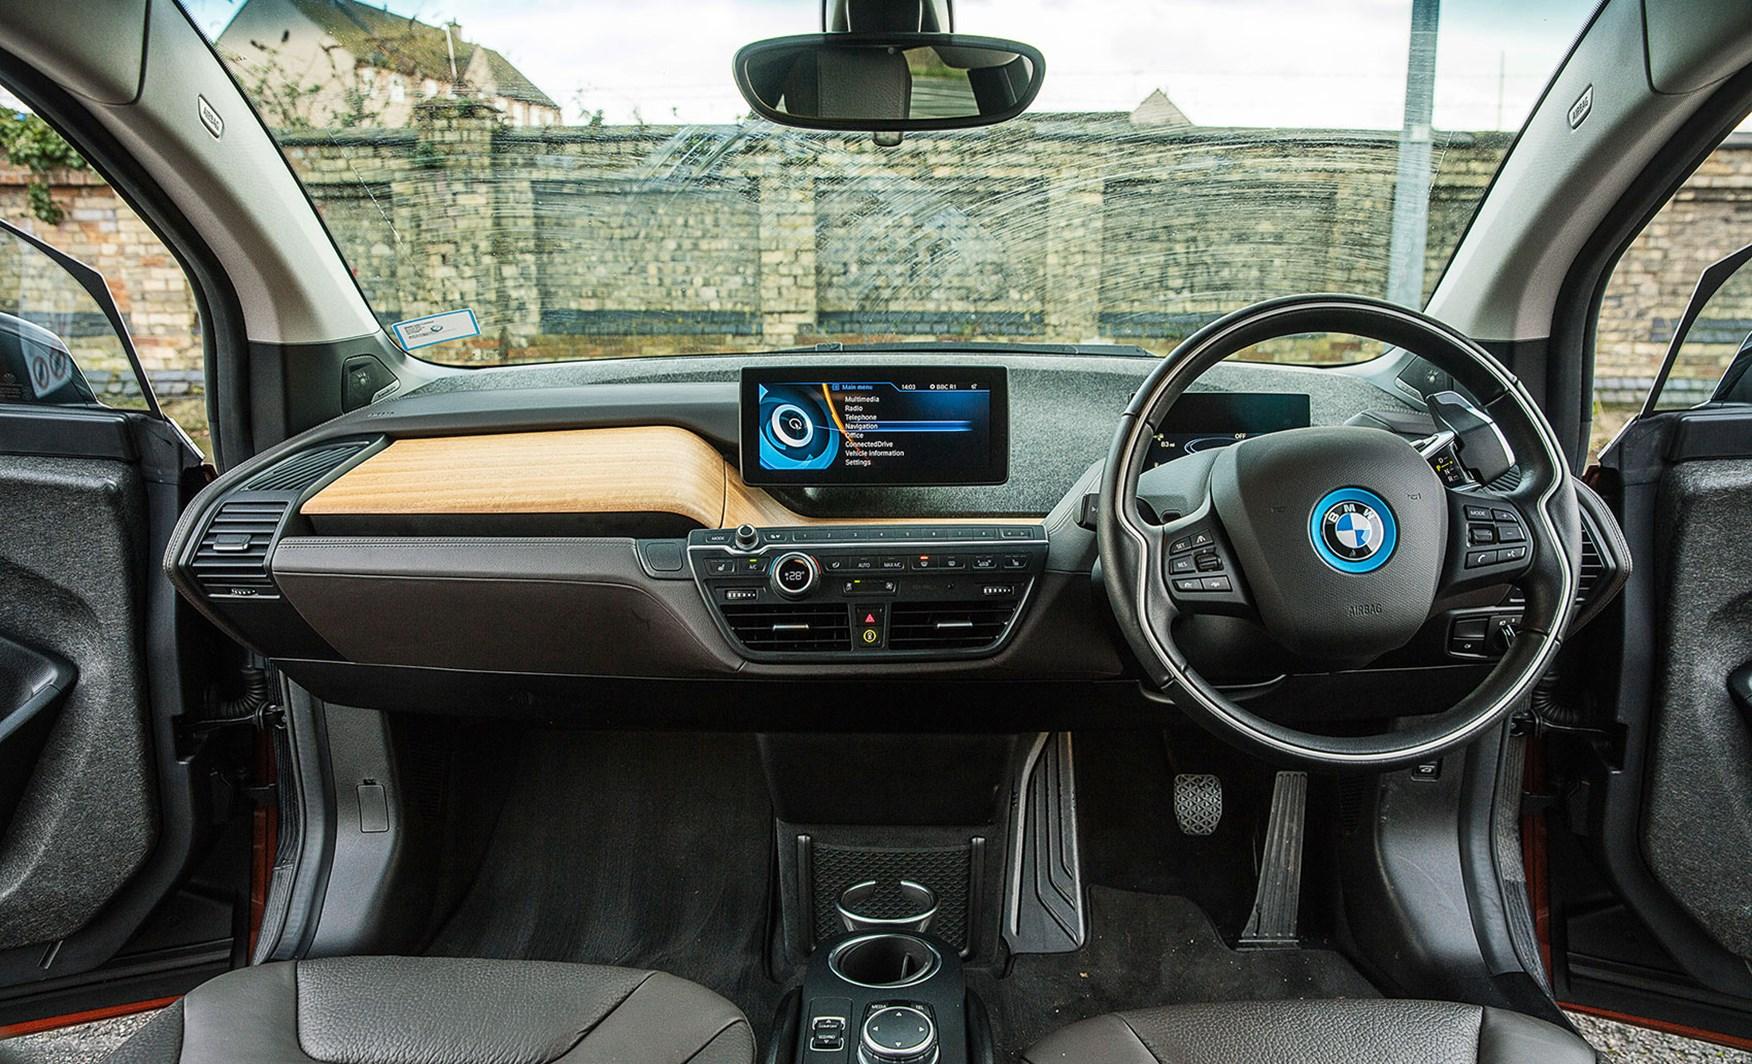 Plug In Babies Vw E Golf Vs Nissan Leaf Vs Bmw I3 Vs Renault Zoe Car March 2016 Car Magazine